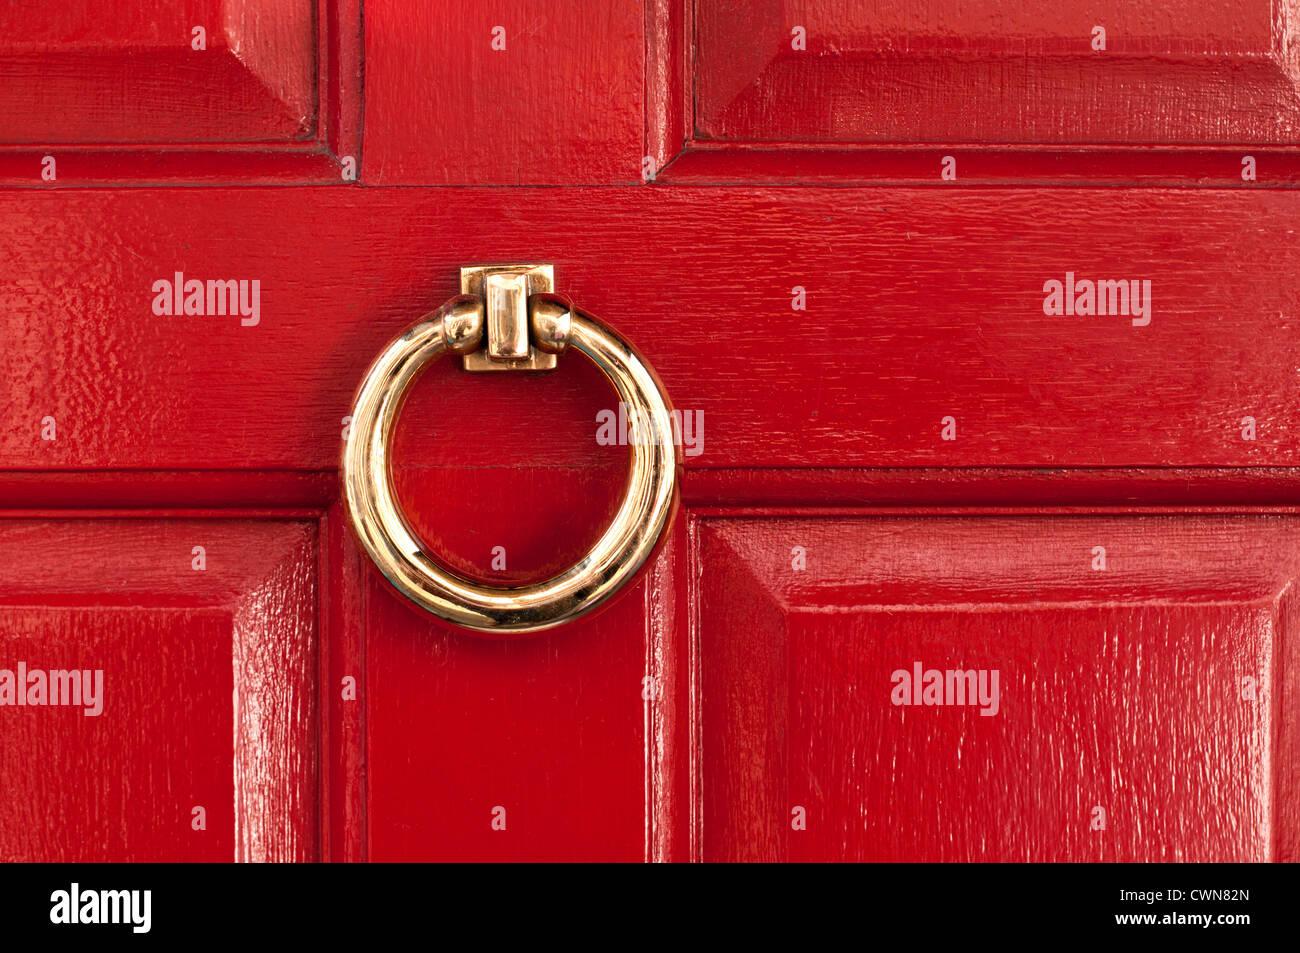 shiny-polished-brass-ring-door-knocker-o